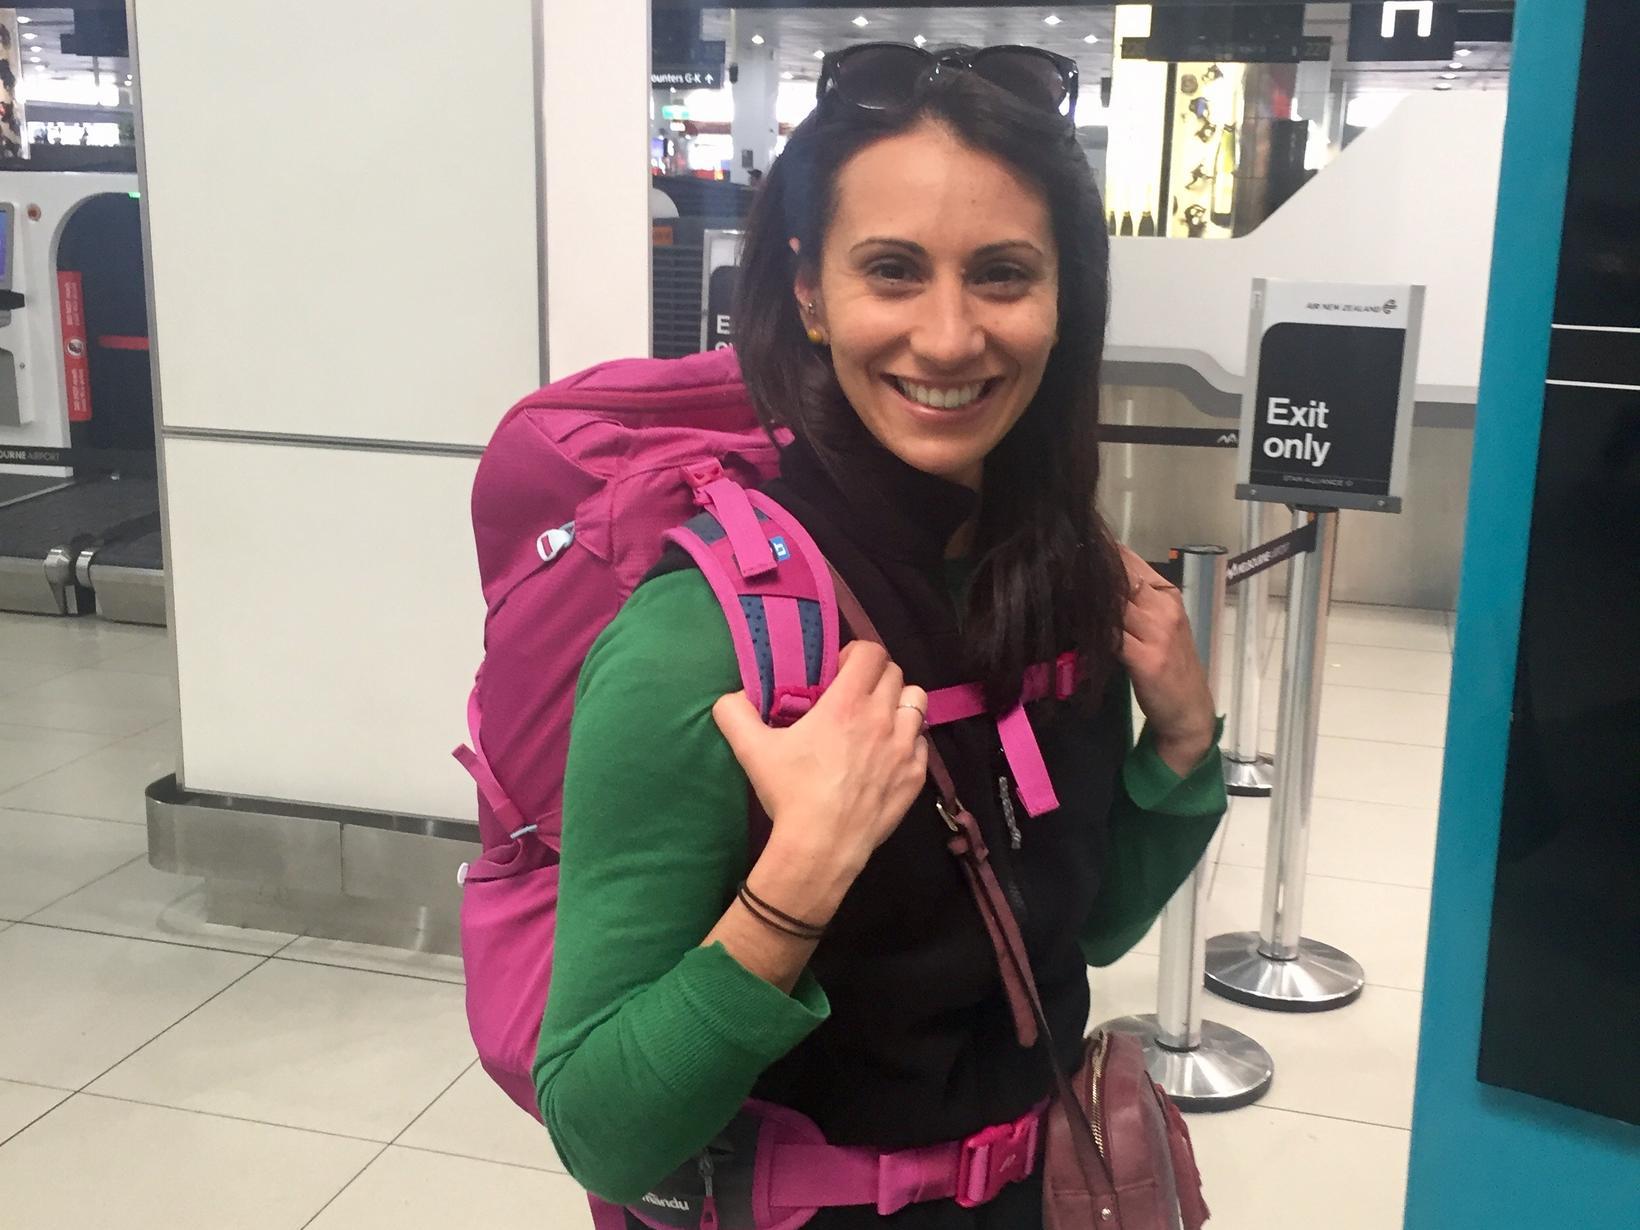 Laura from Mornington, Victoria, Australia